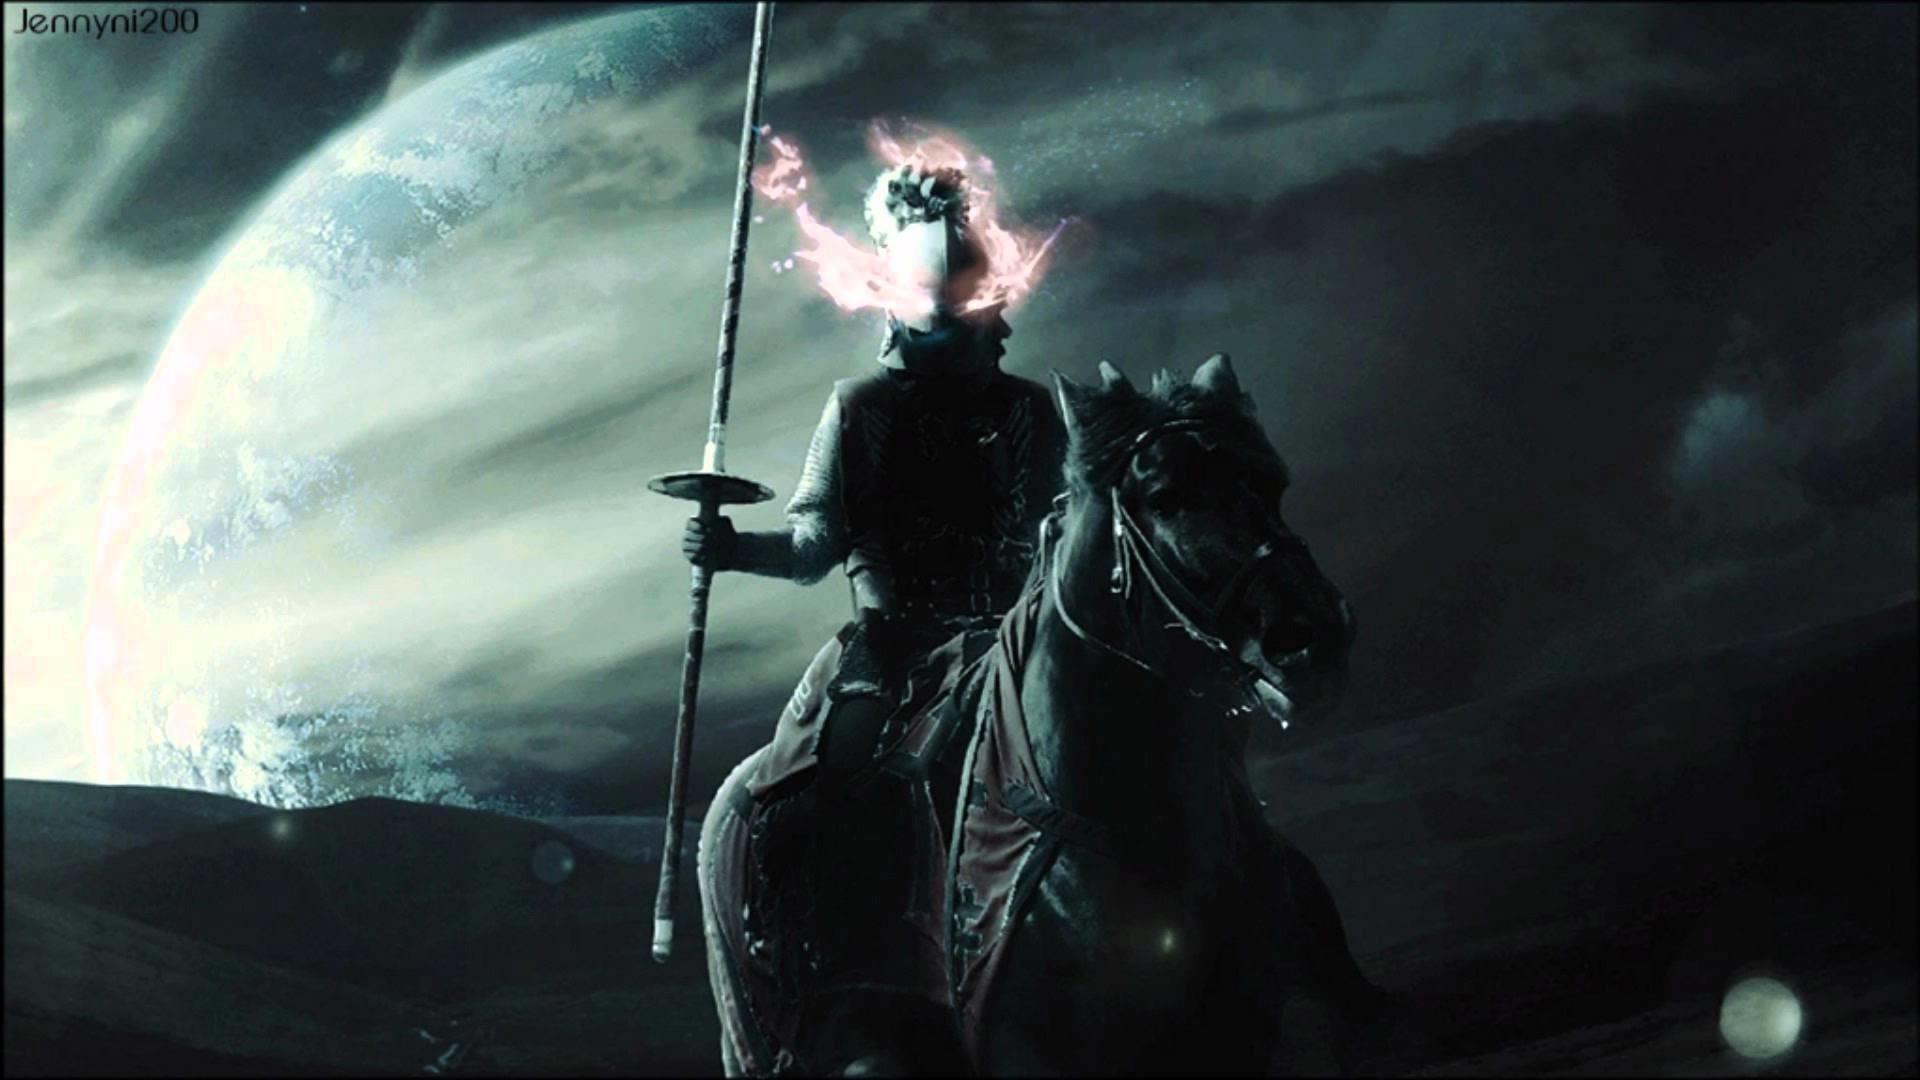 Immediate Music – The Knights Templar (Album – Epic Adventure) – YouTube